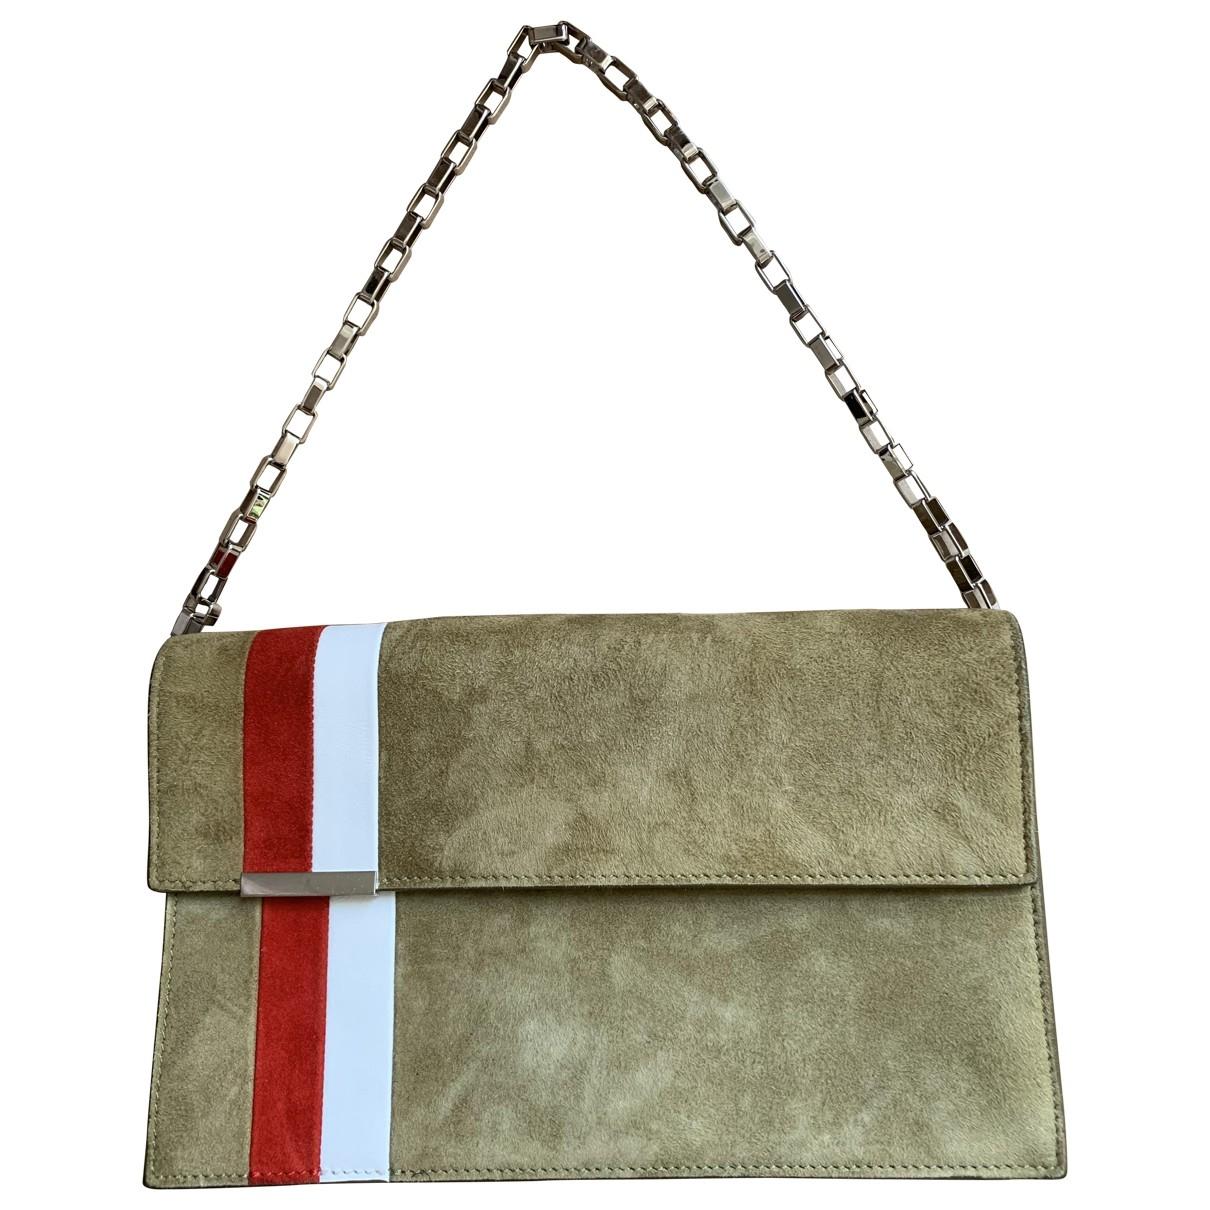 Tomasini \N Khaki Suede handbag for Women \N